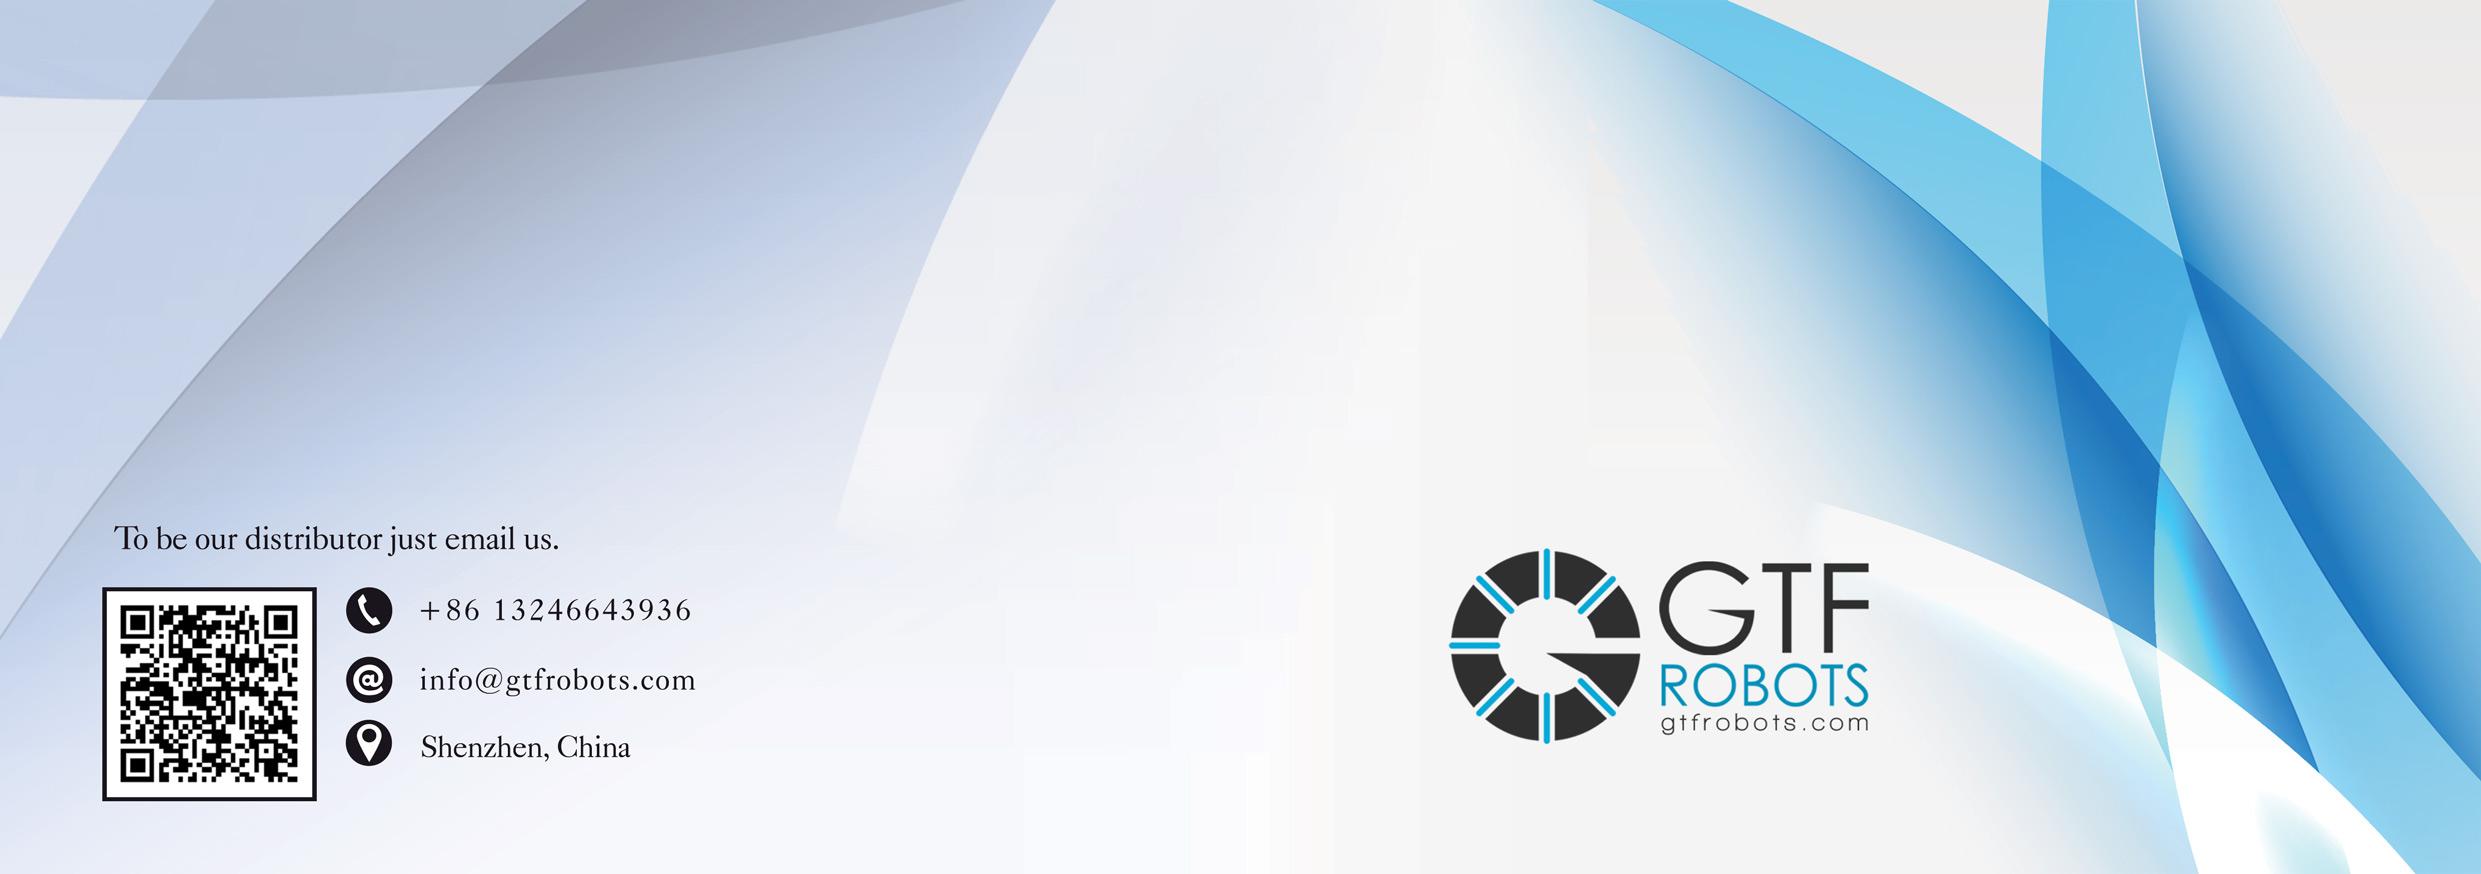 Robot wheels producer